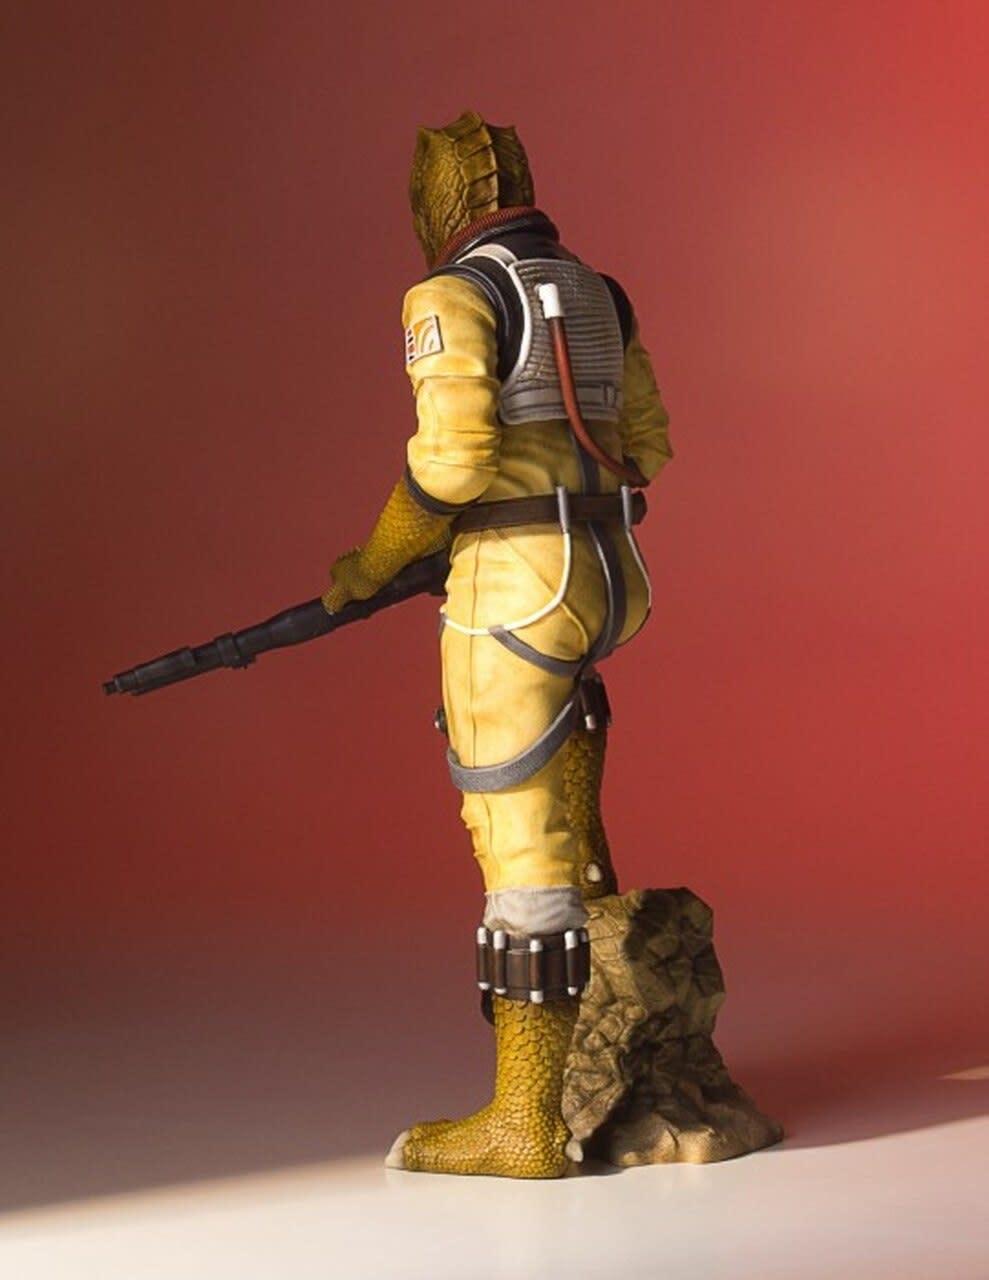 Gentle Giant Star Wars Bossk 1 8 Scale Statue